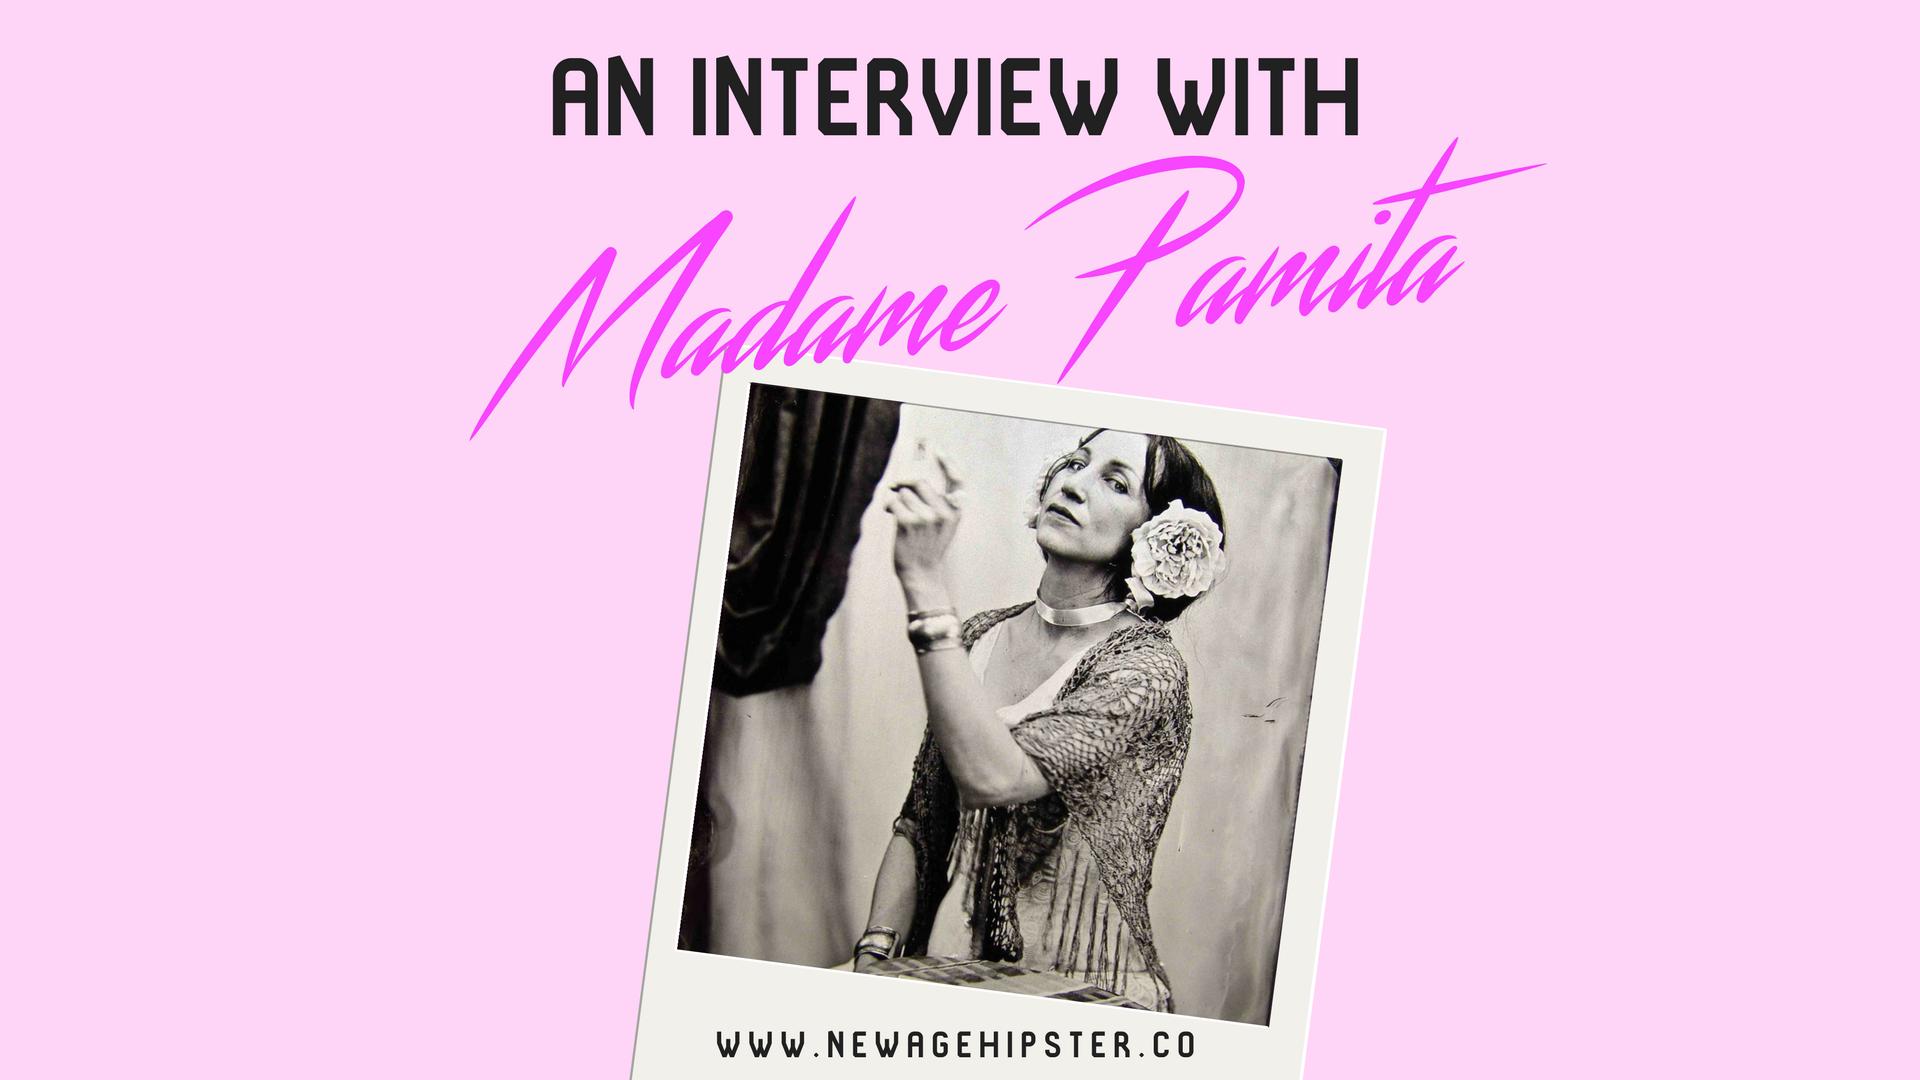 Madame Pamita on New Age Hipster x